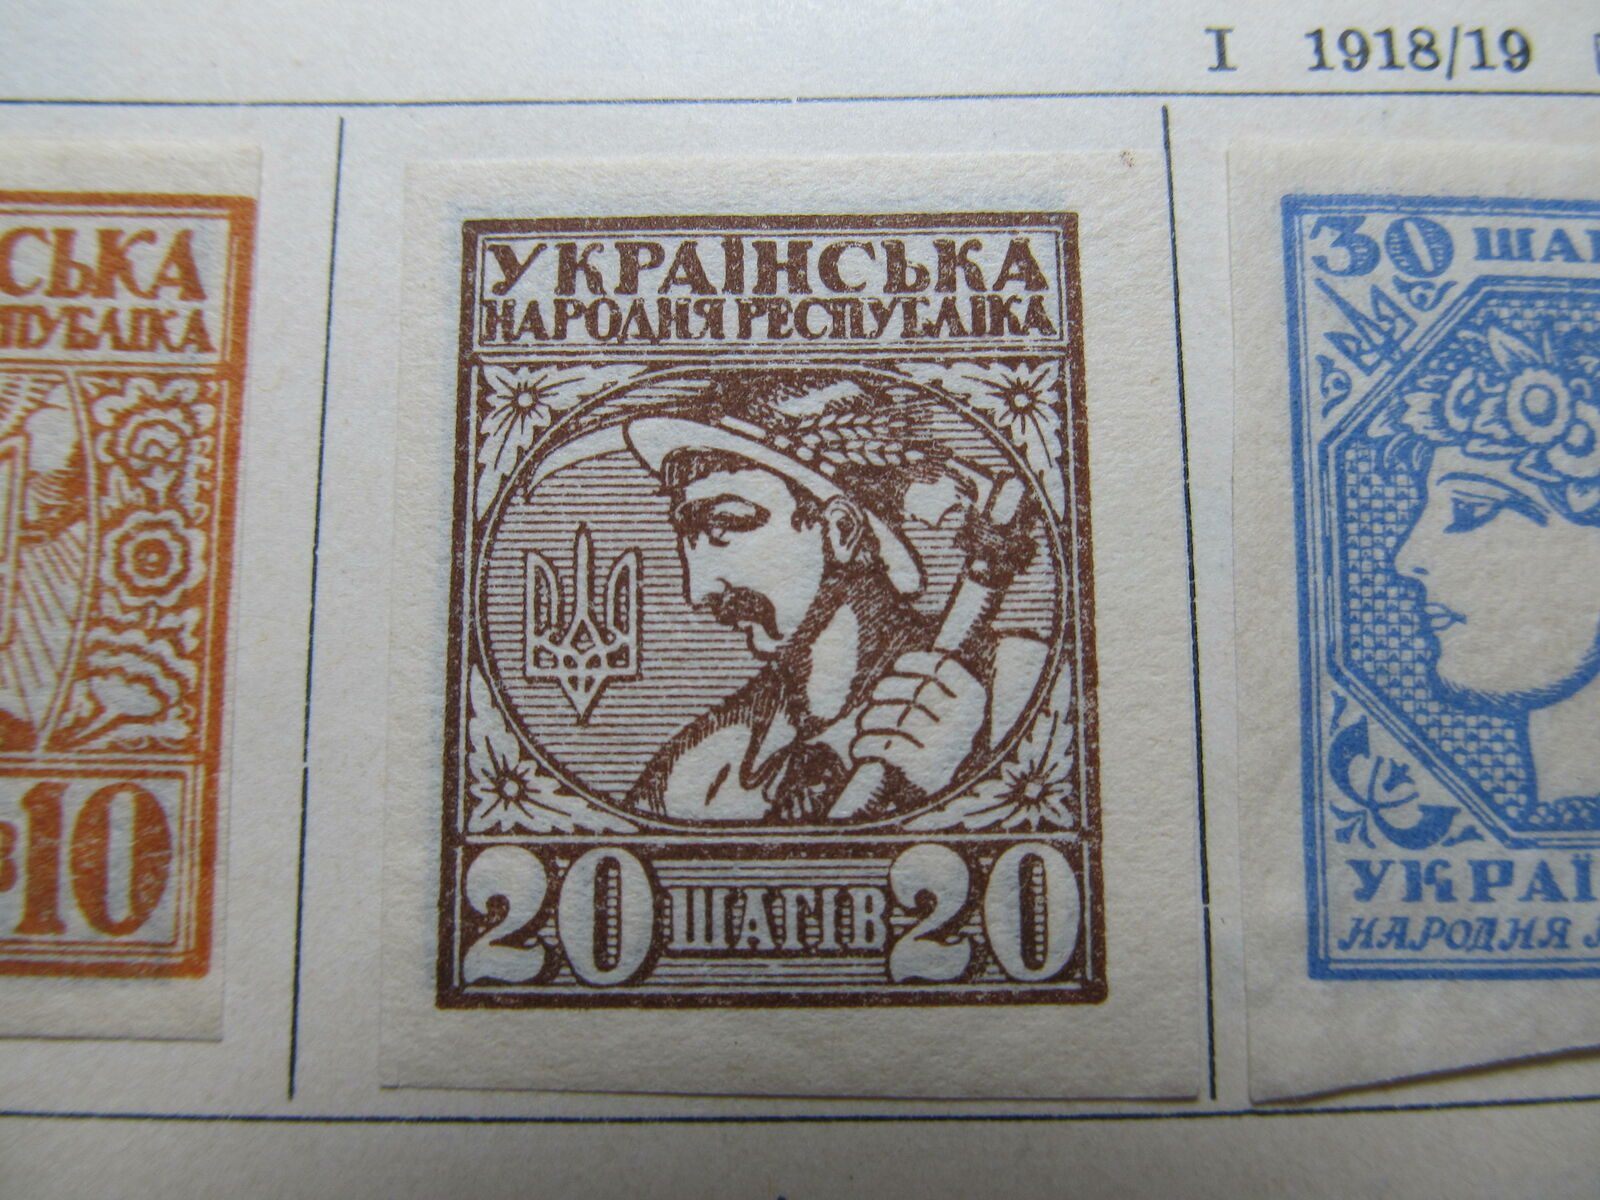 Ukraine Ucraina 1918 20sh Imperf Fine MH* A5P21F235